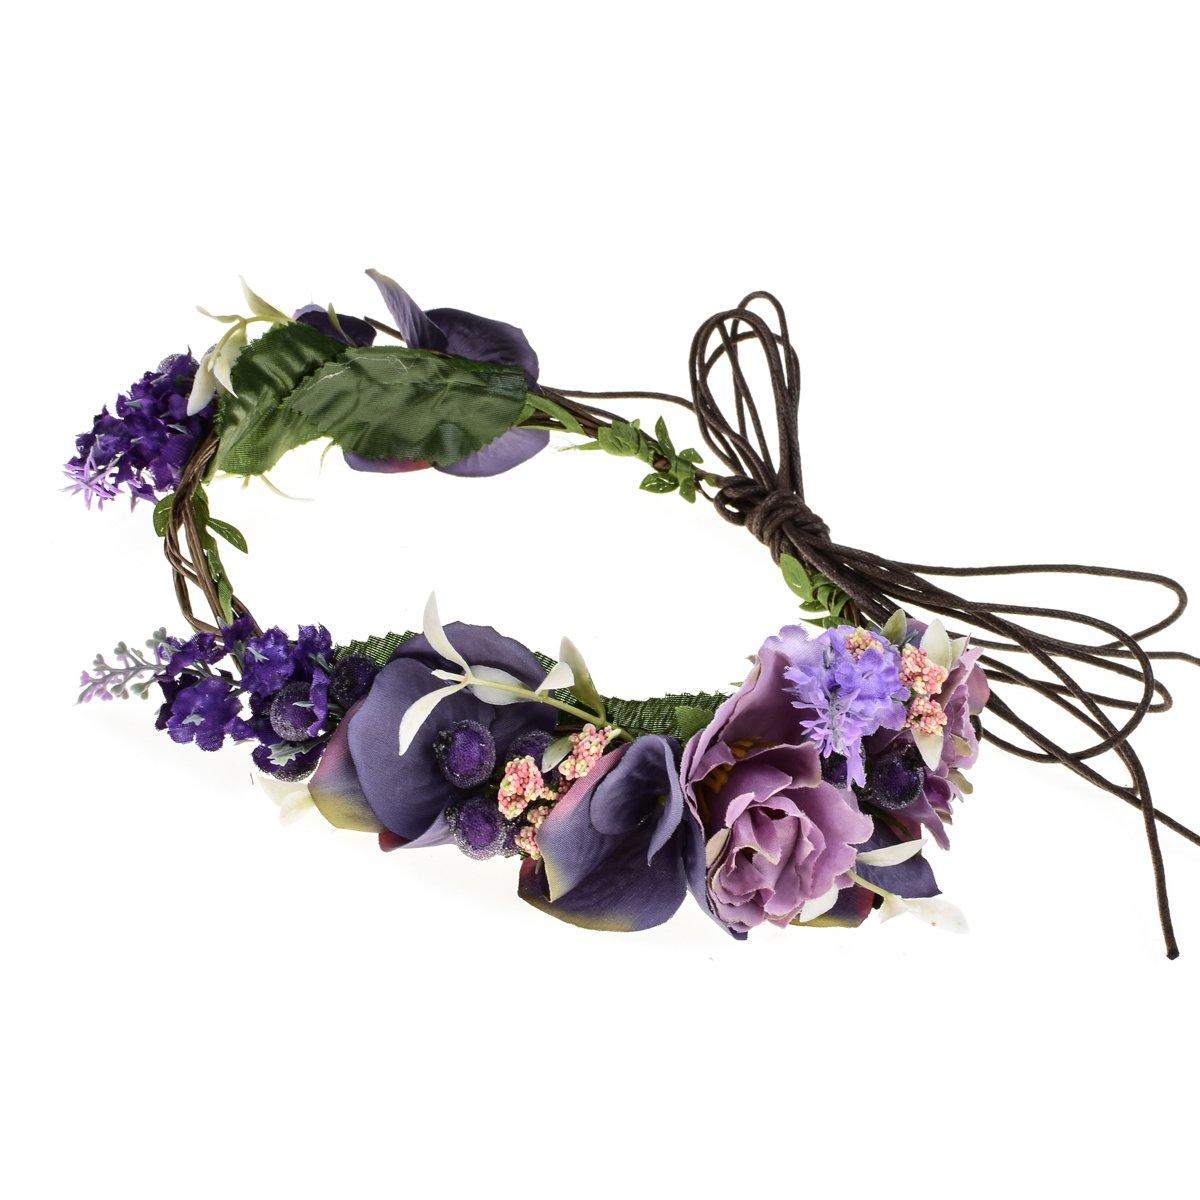 Floral Fall Adjustable Bridal Flower Garland Headband Flower Crown Hair Wreath Halo F-83 (Lavender)